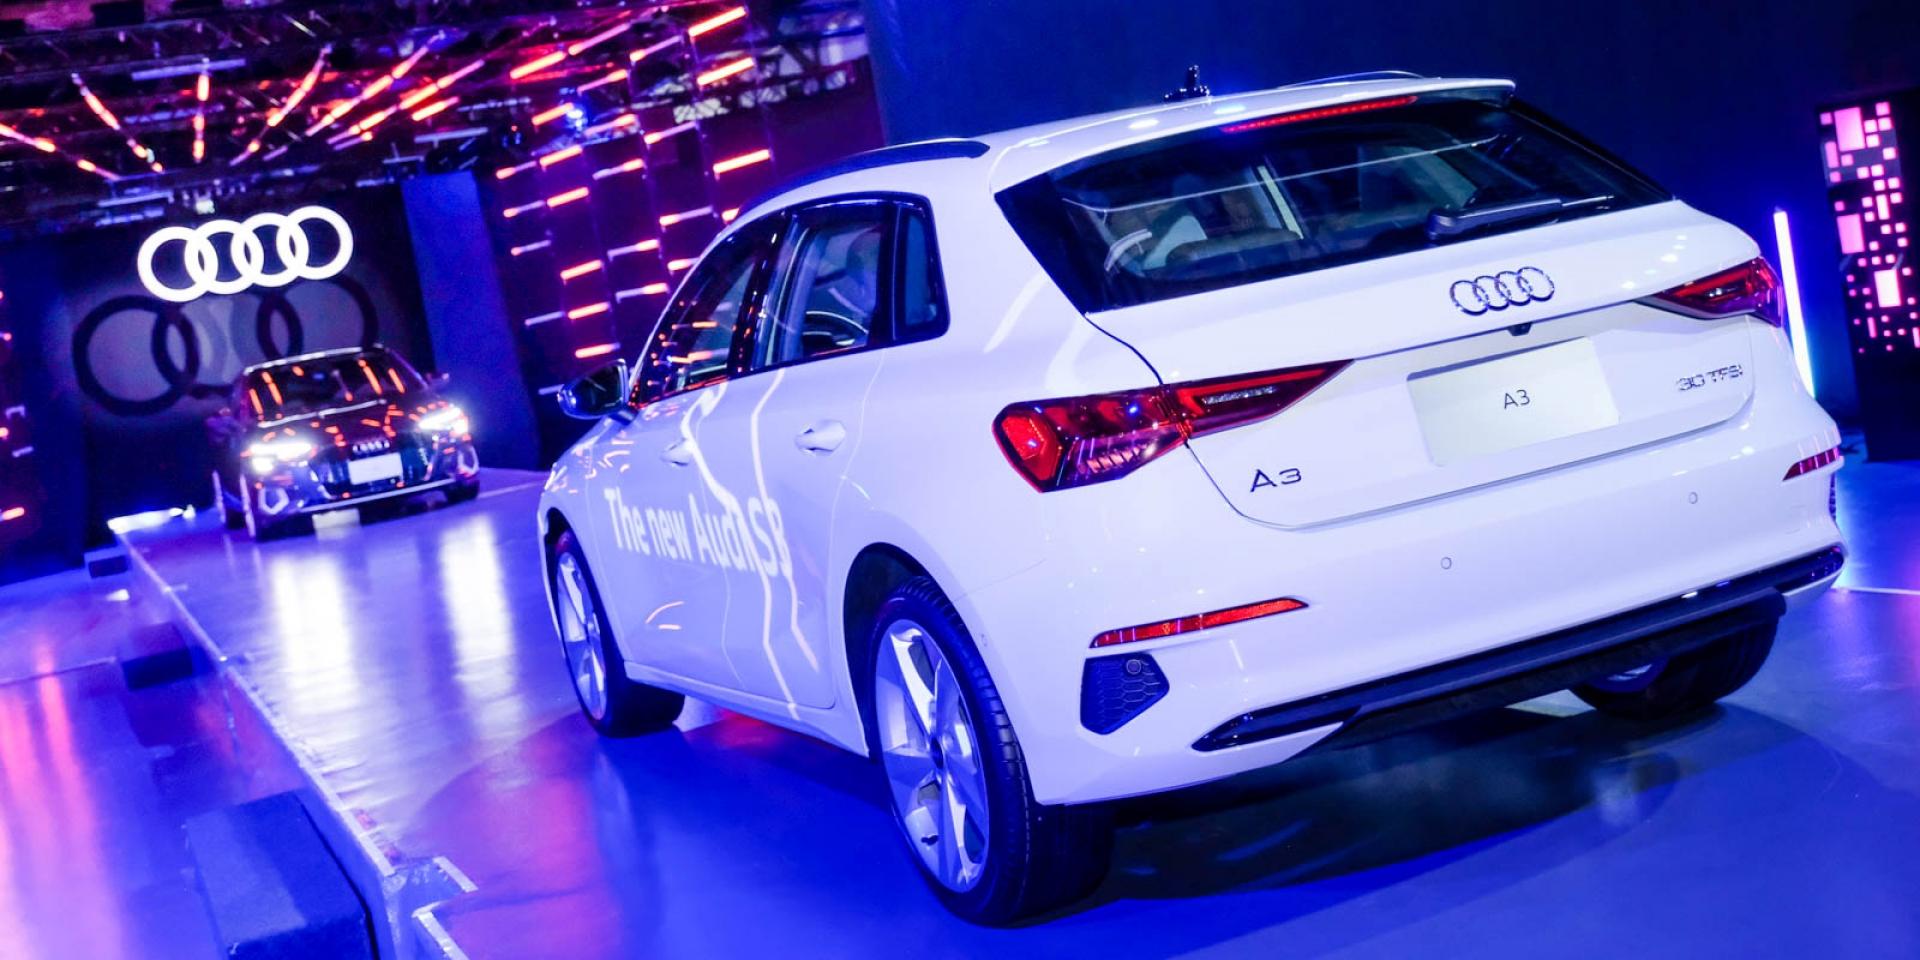 1.0L引擎、48V輕油電導入!Audi A3/S3 Sportback 138萬元起正式發表